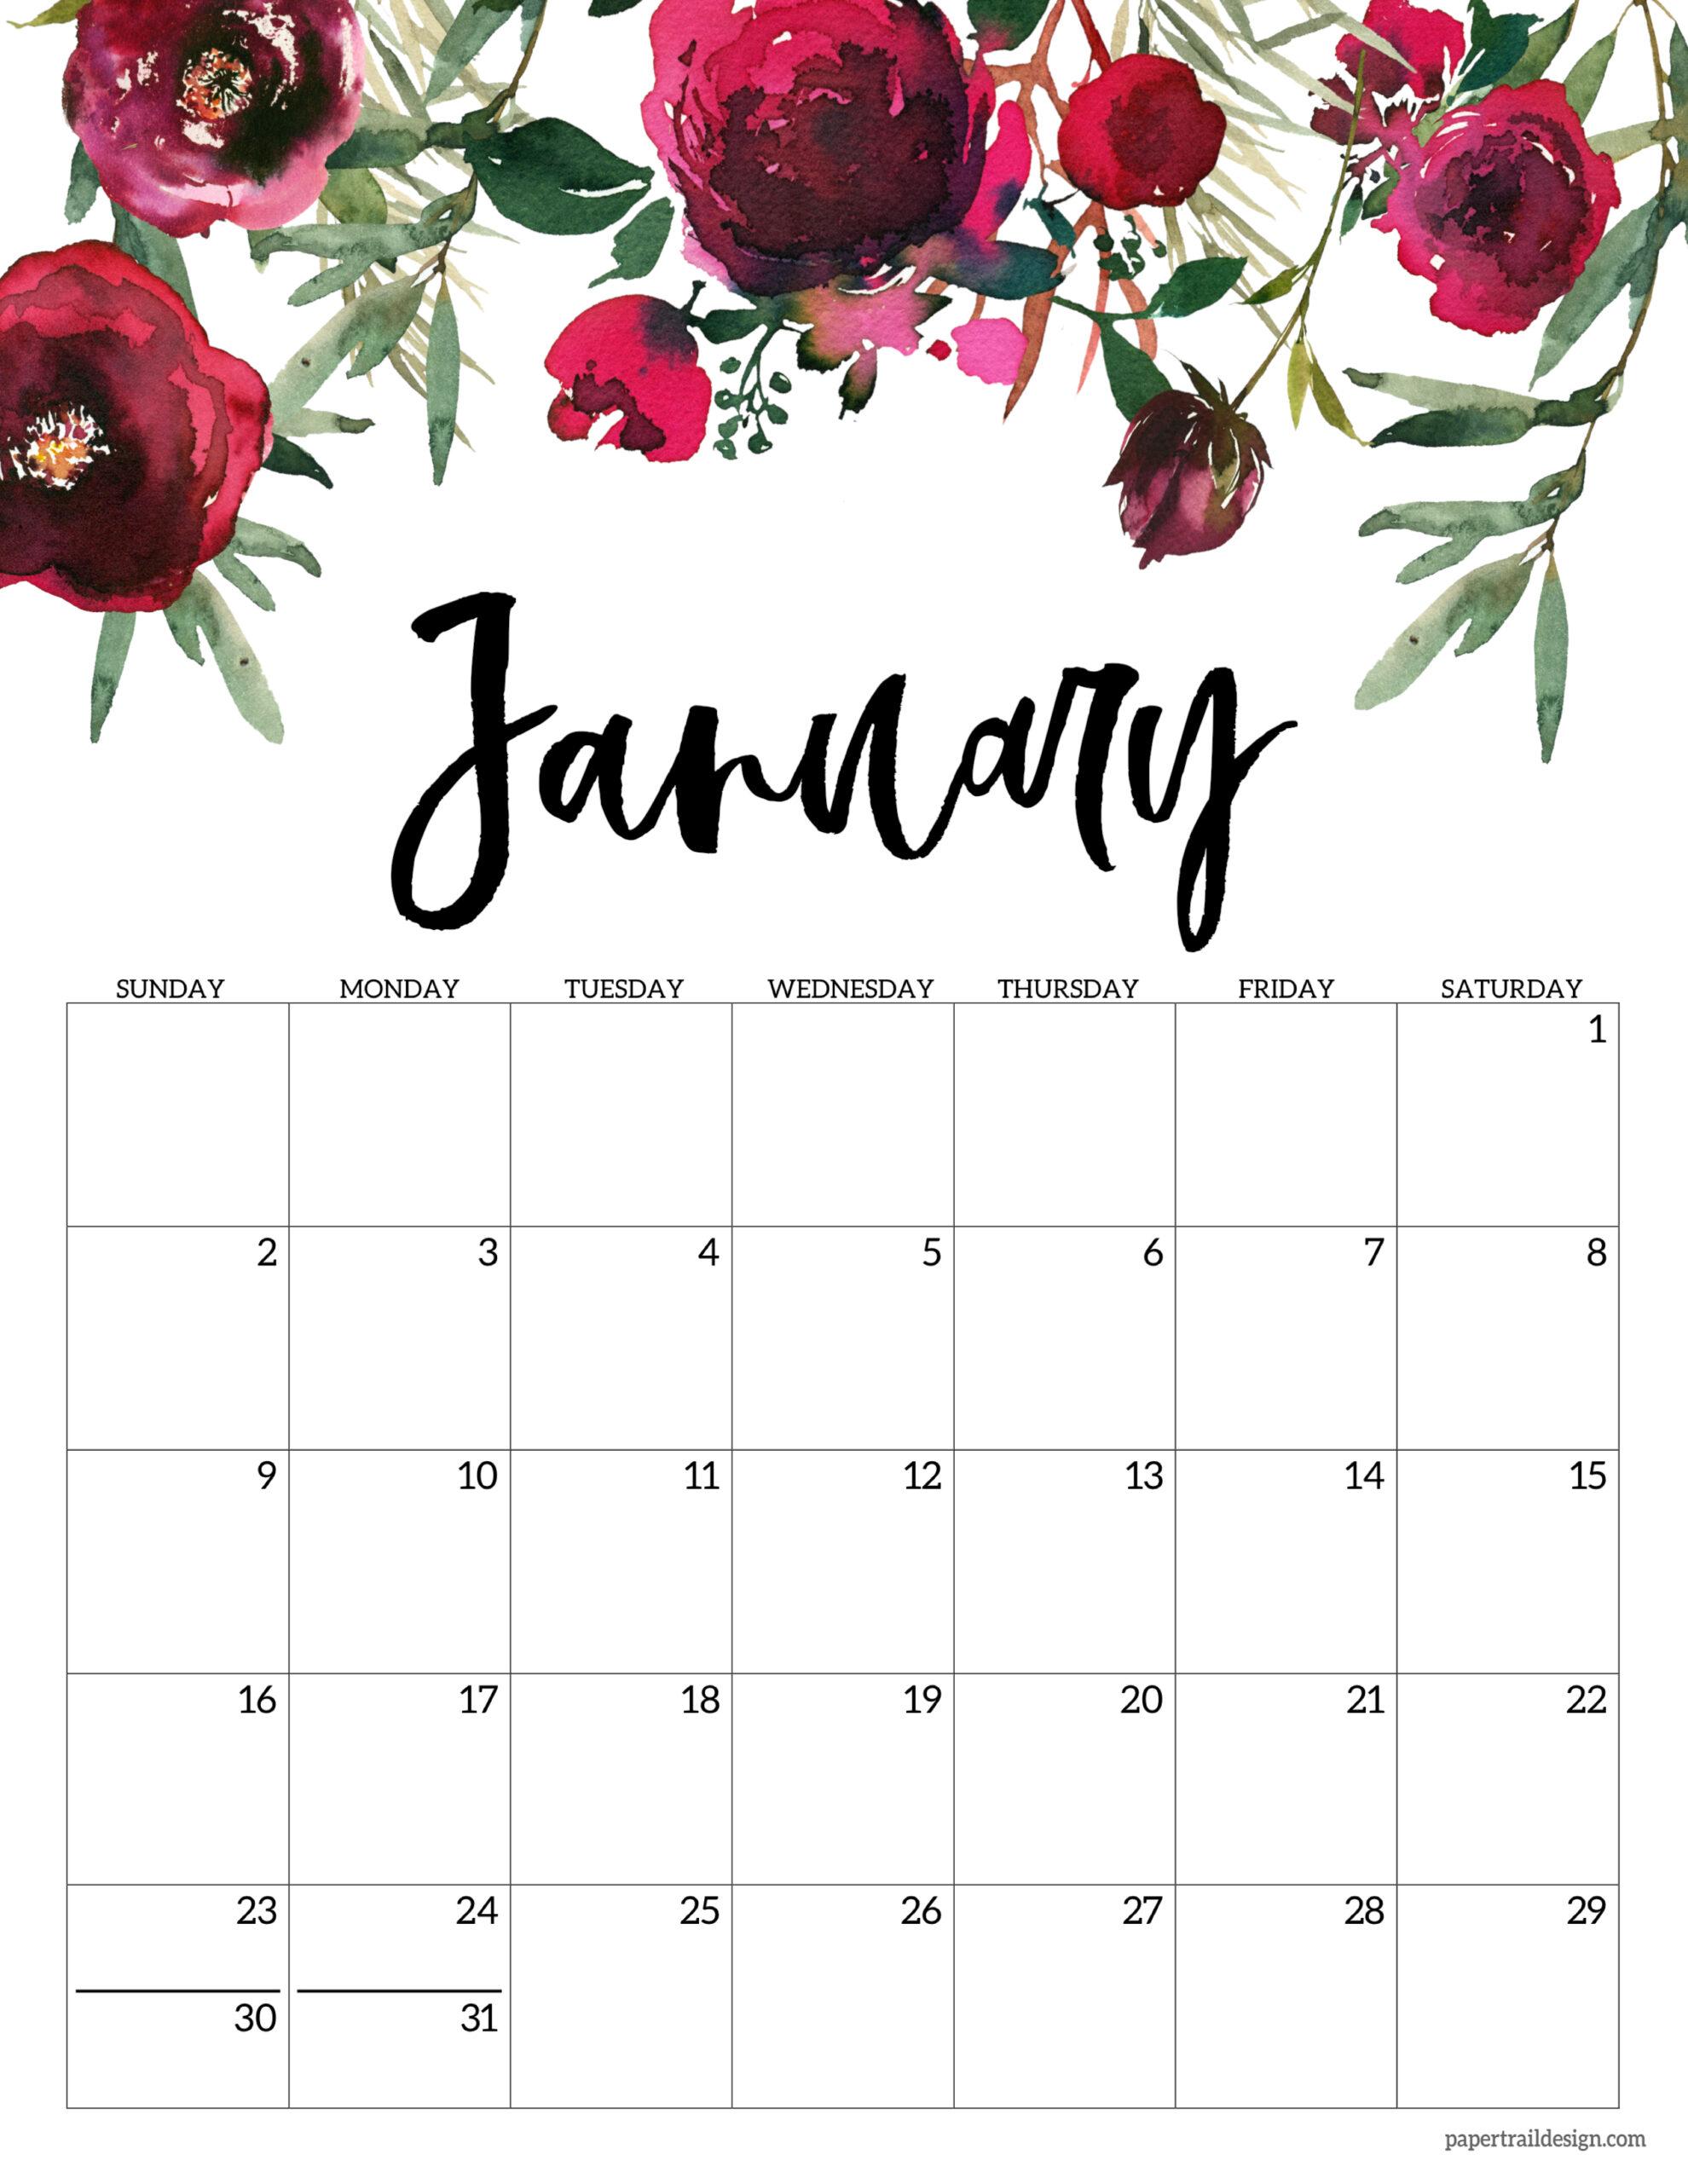 2022 January Calendar Printable.Free 2022 Calendar Printable Floral Paper Trail Design